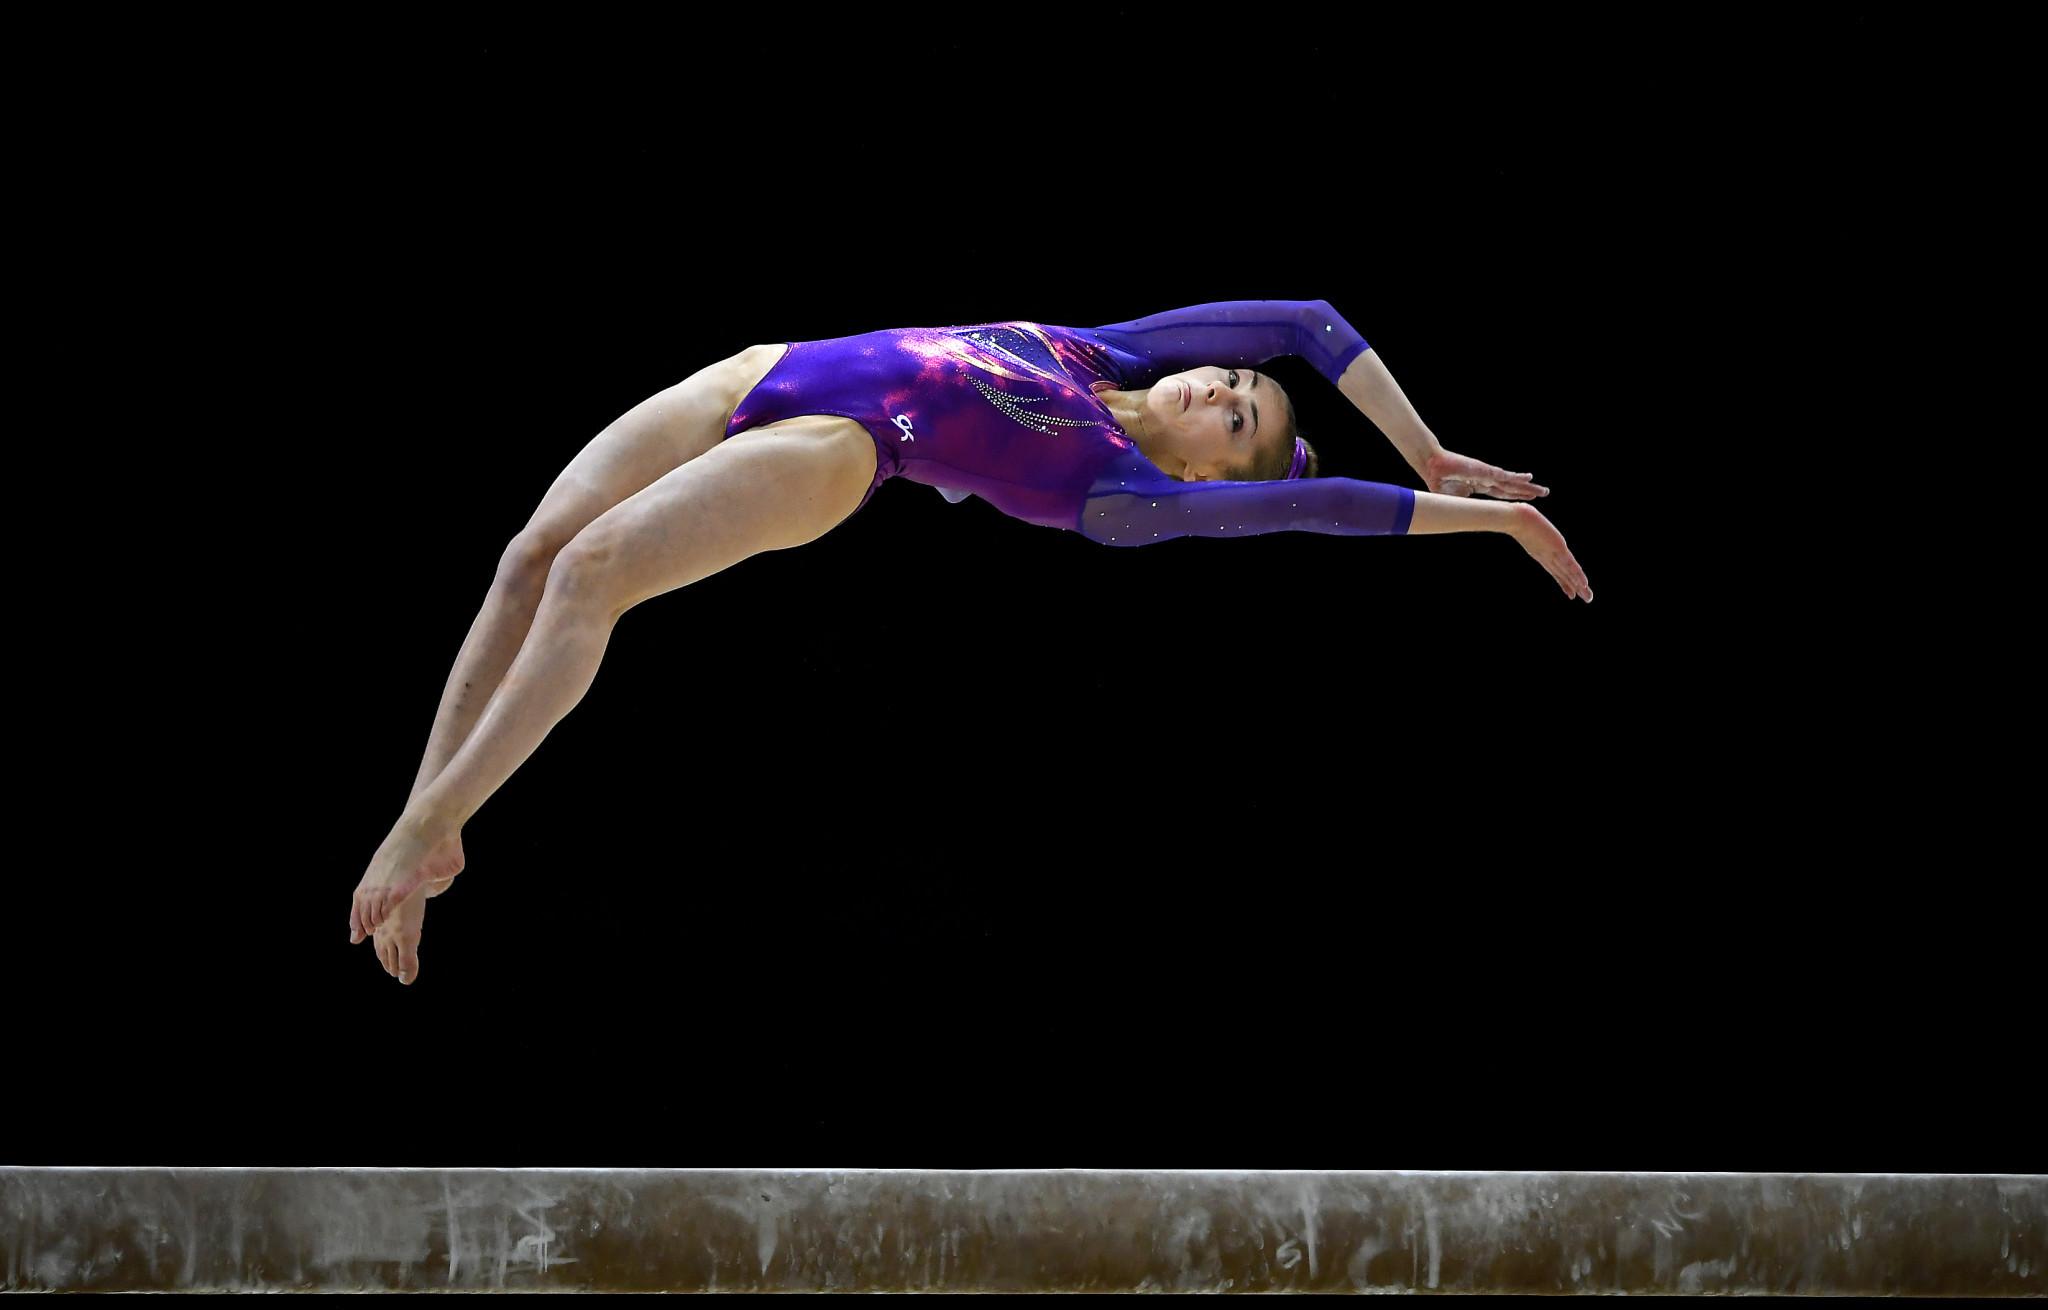 Stanhope replaces injured Fragapane on England gymnastics team for Gold Coast 2018